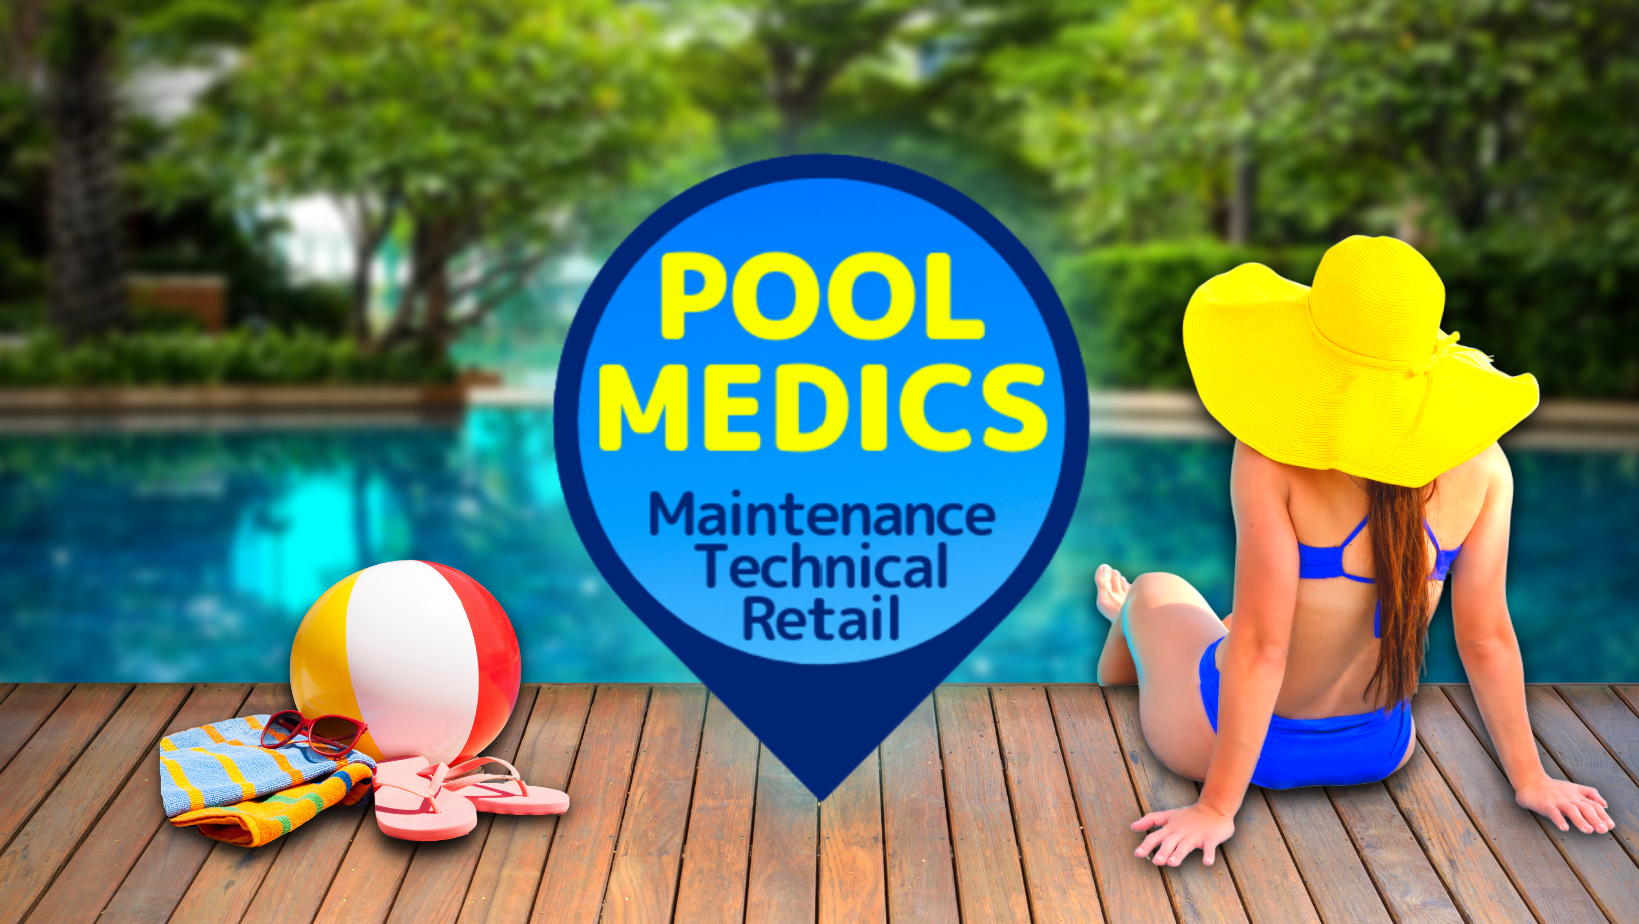 Pool Medics